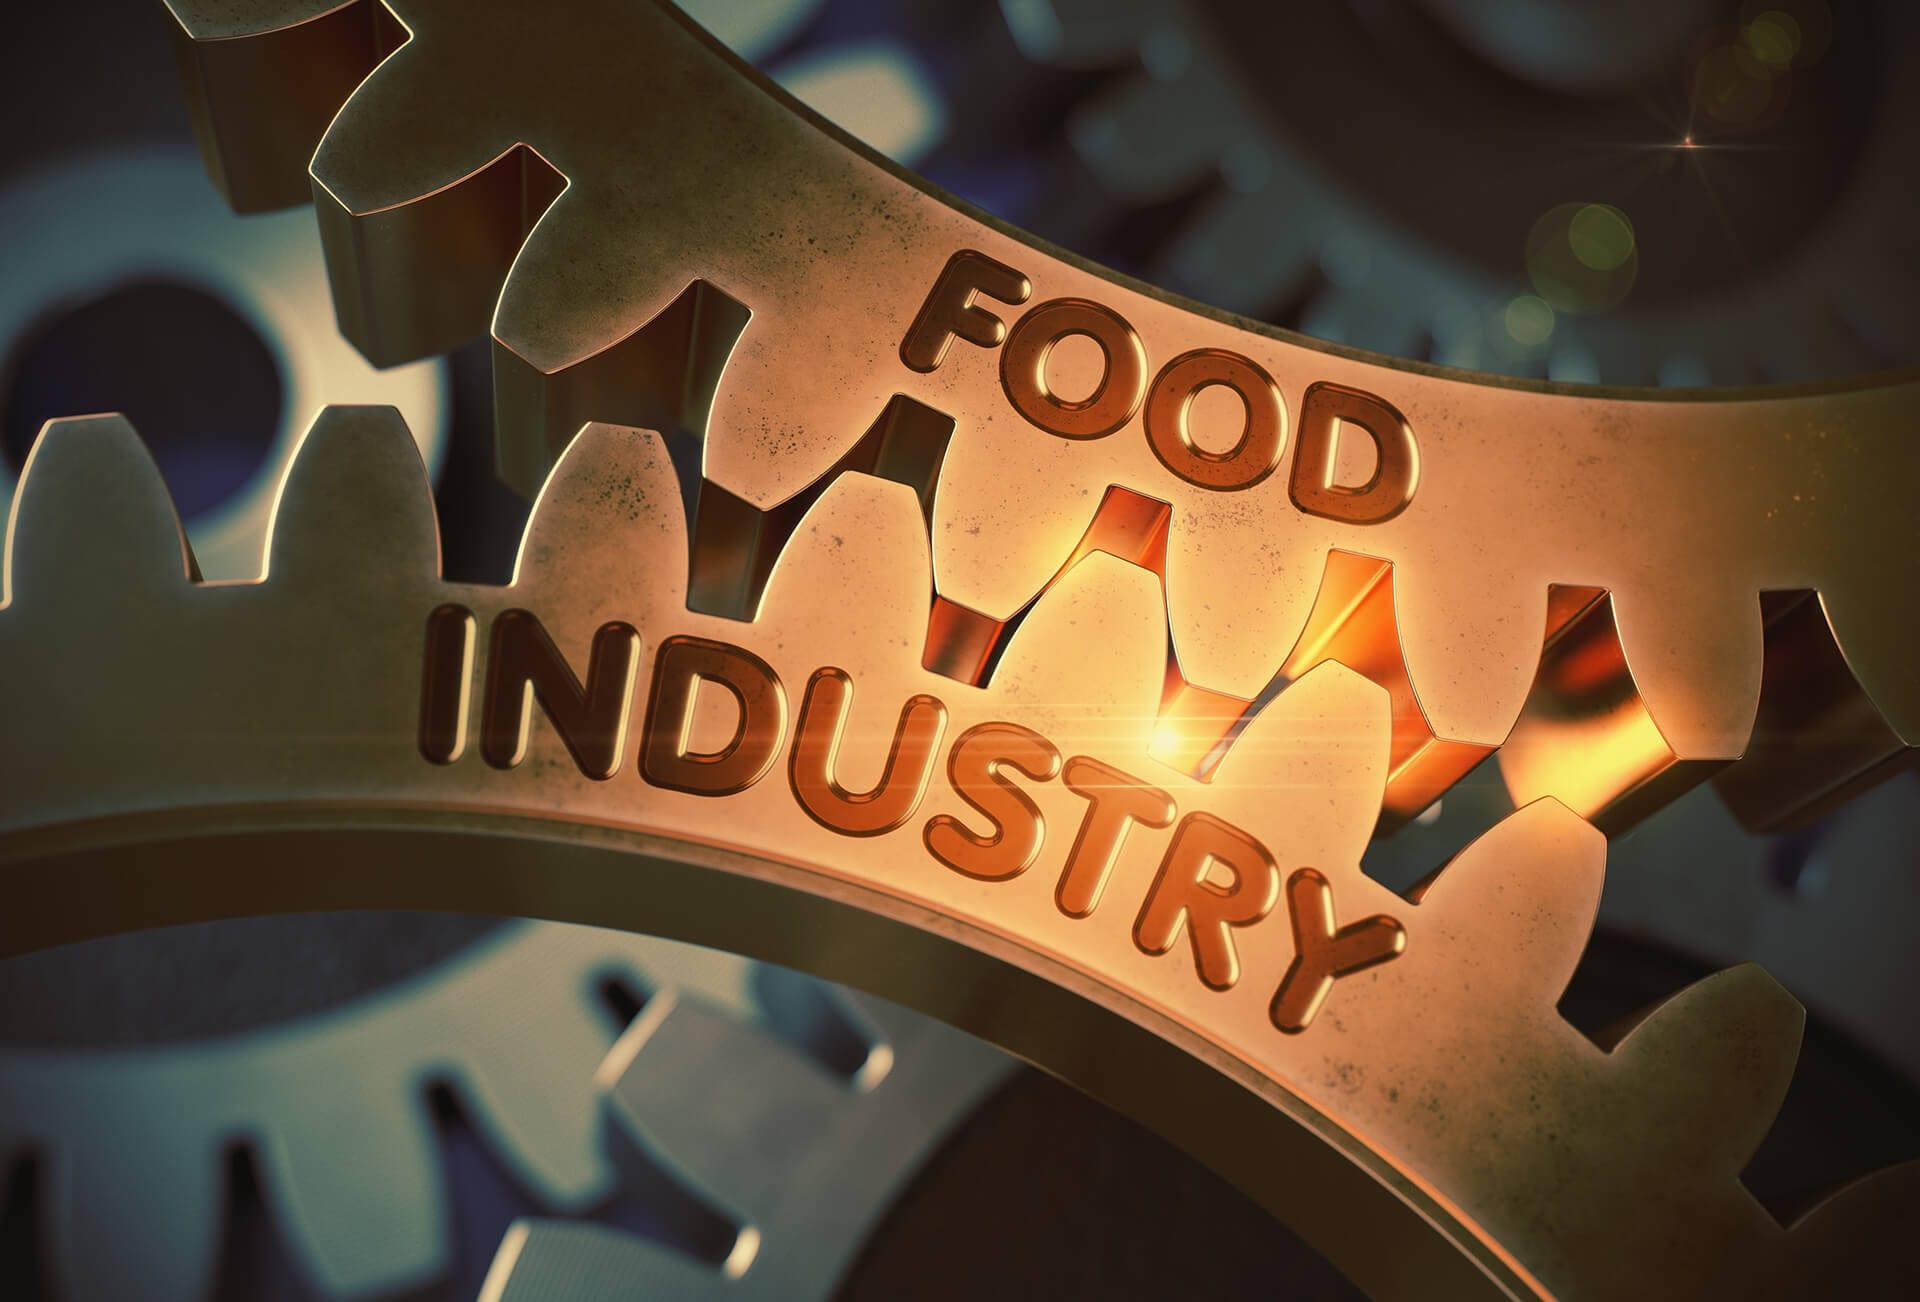 Food Industry Gears